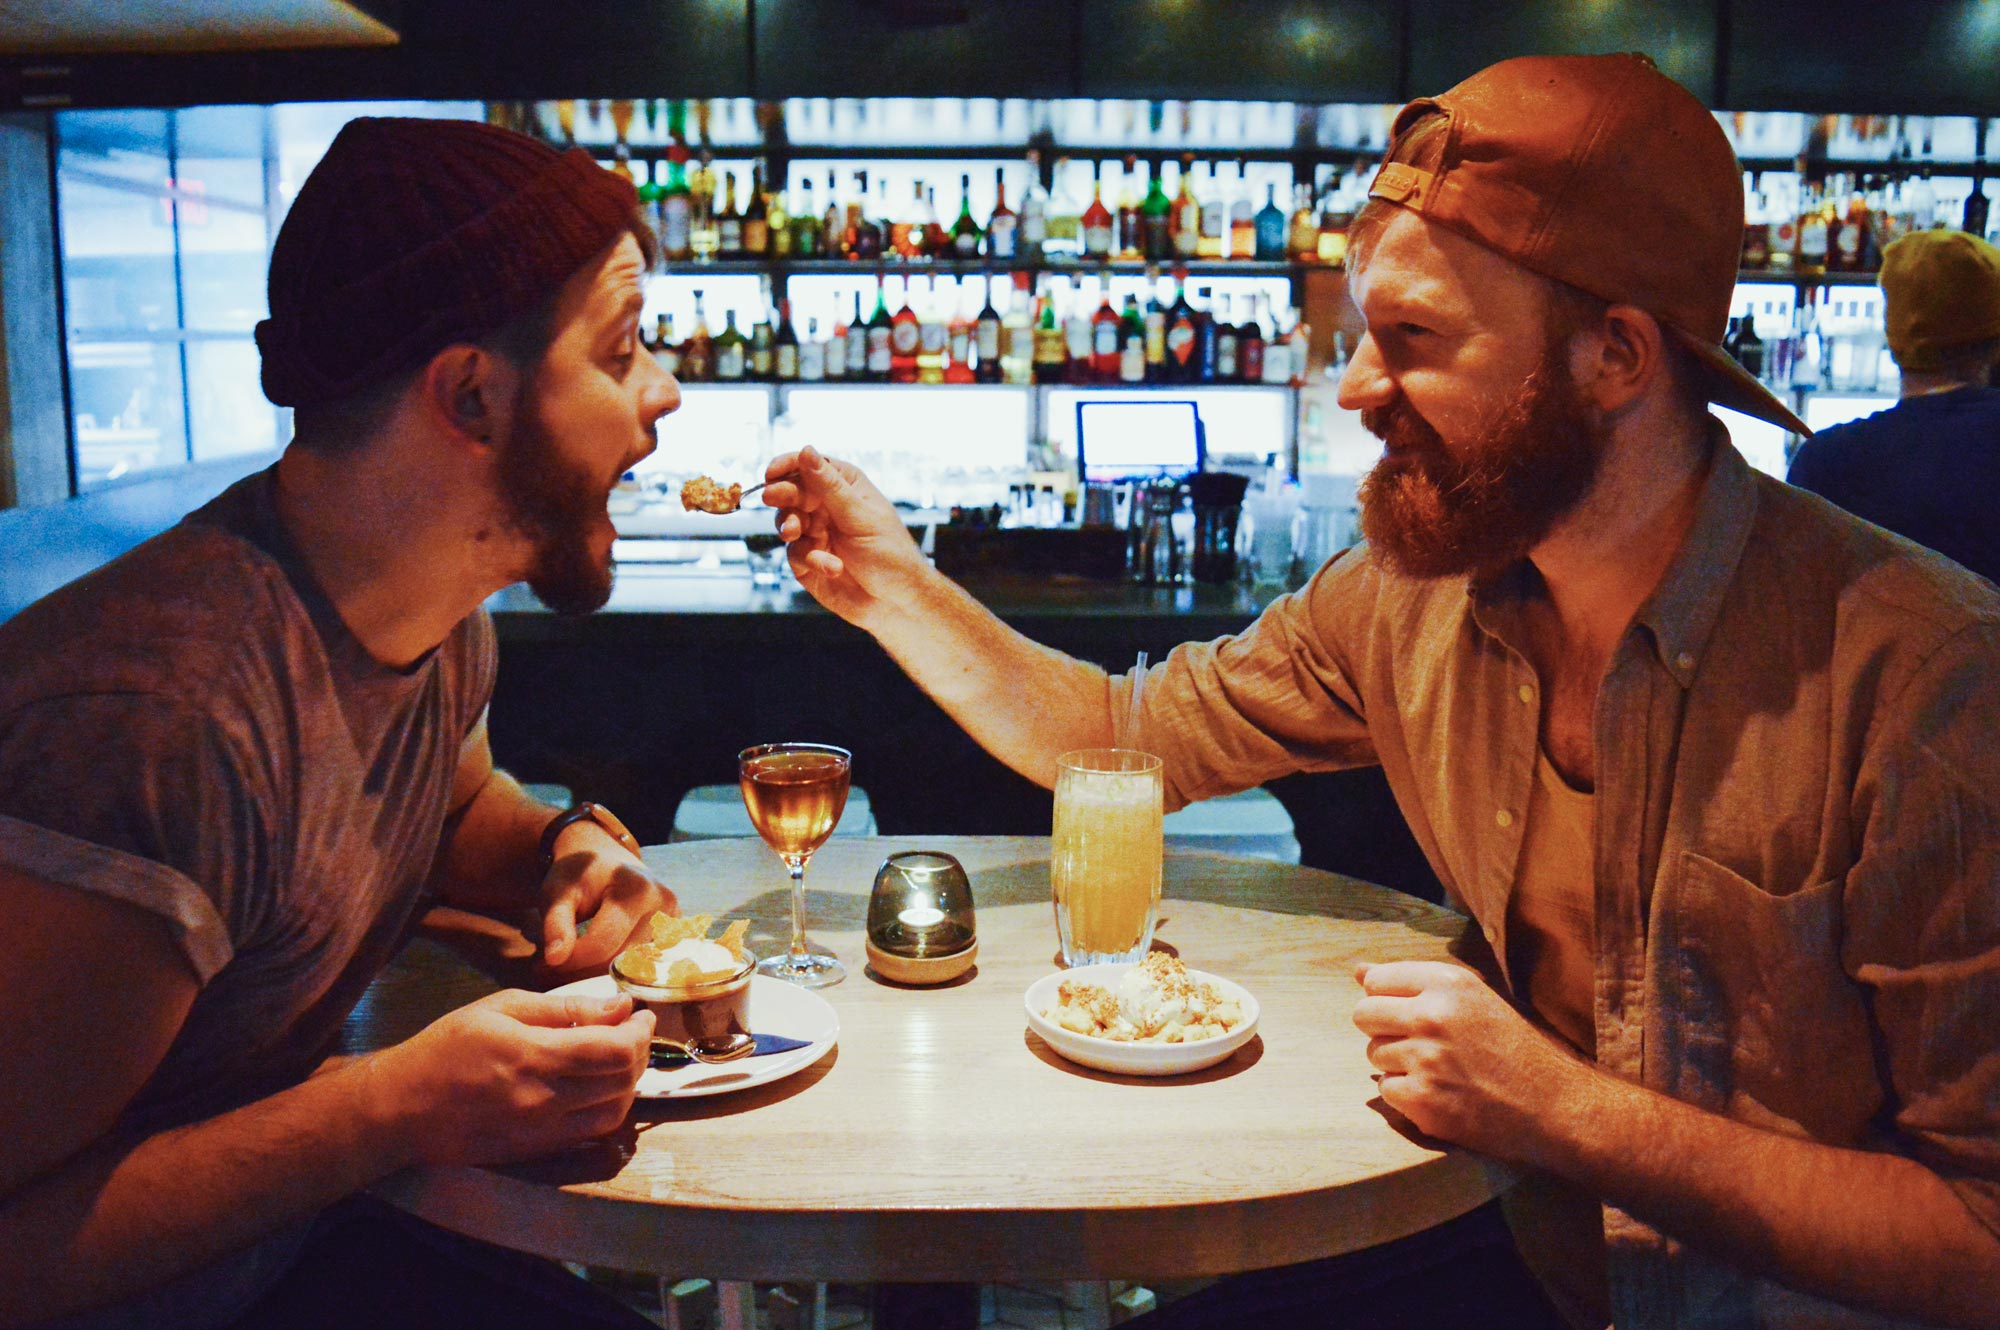 gay dating vancouver bc